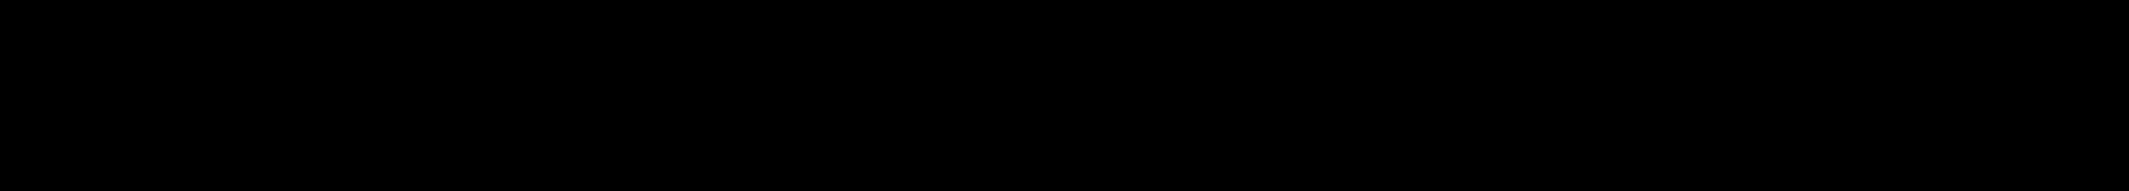 Museo Sans Cyrillic 100